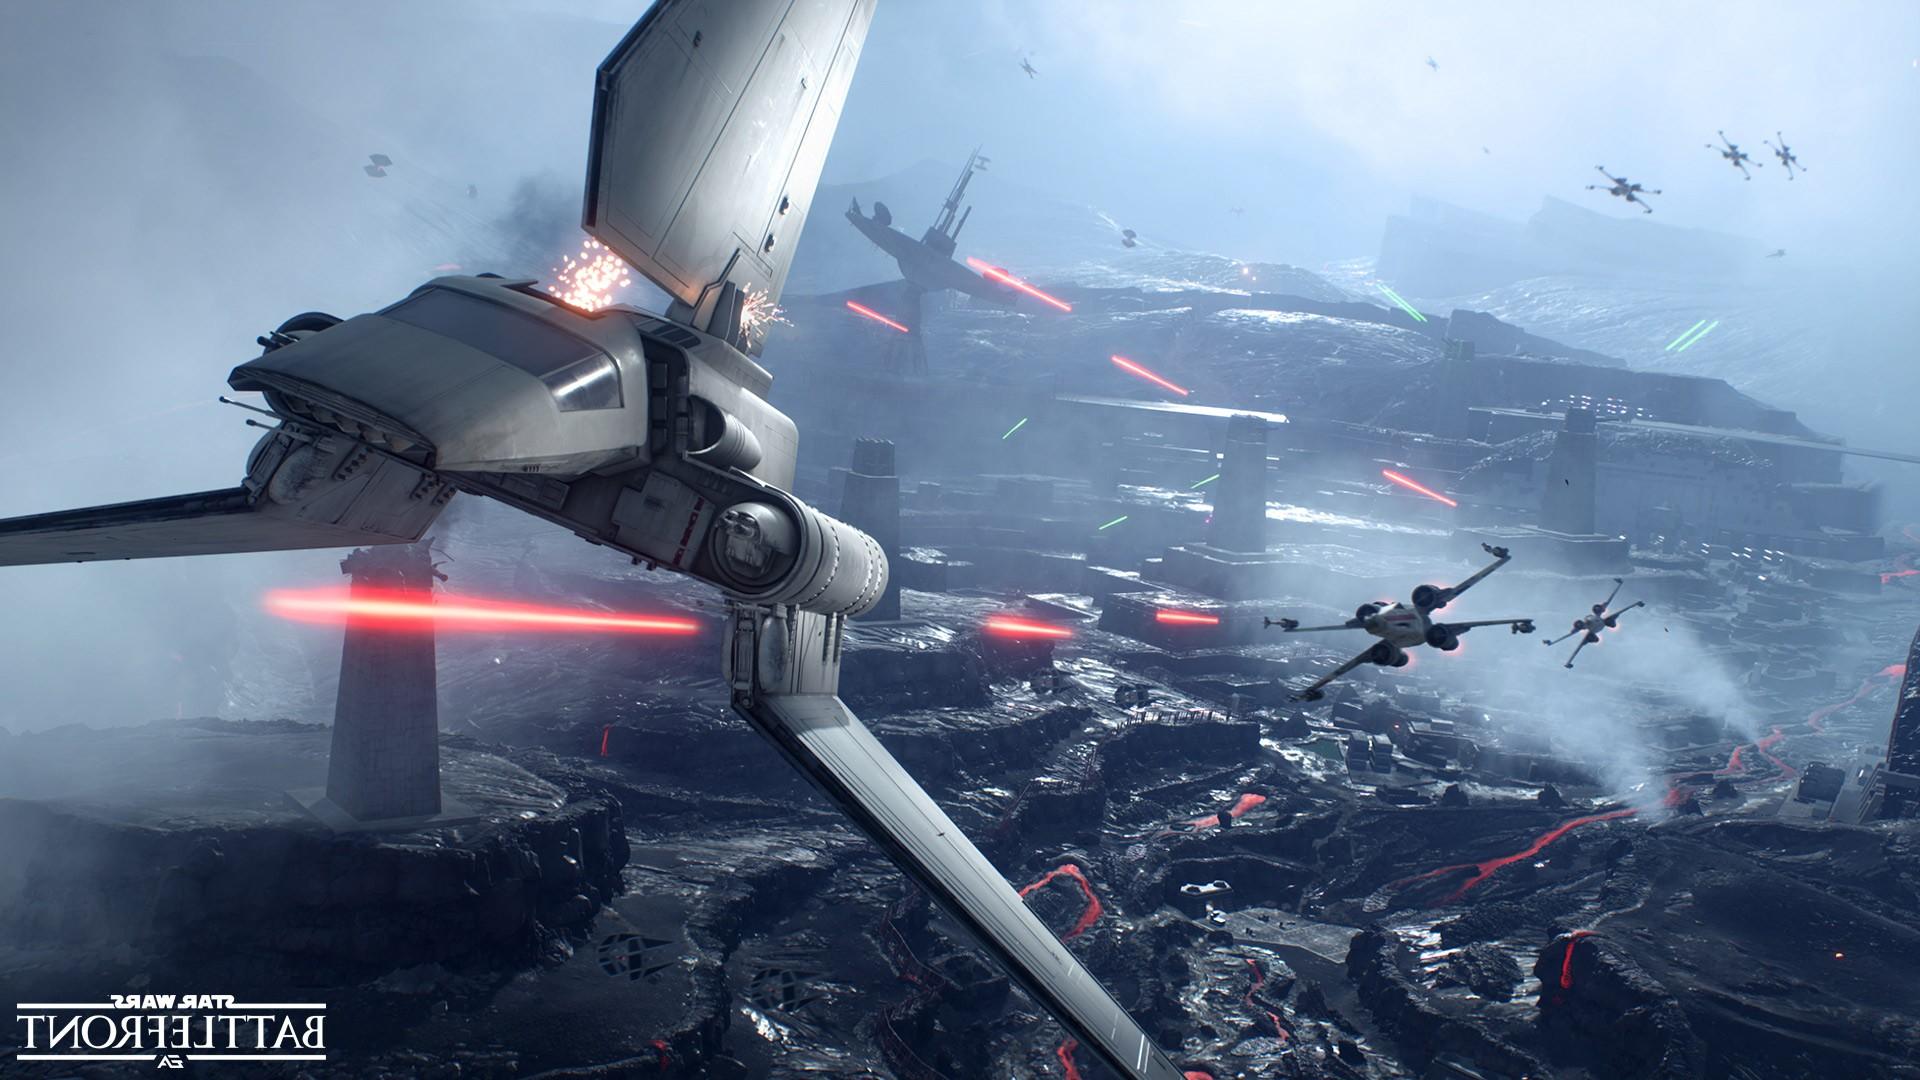 1440x900 Star Wars Battlefront 1440x900 Resolution Hd 4k